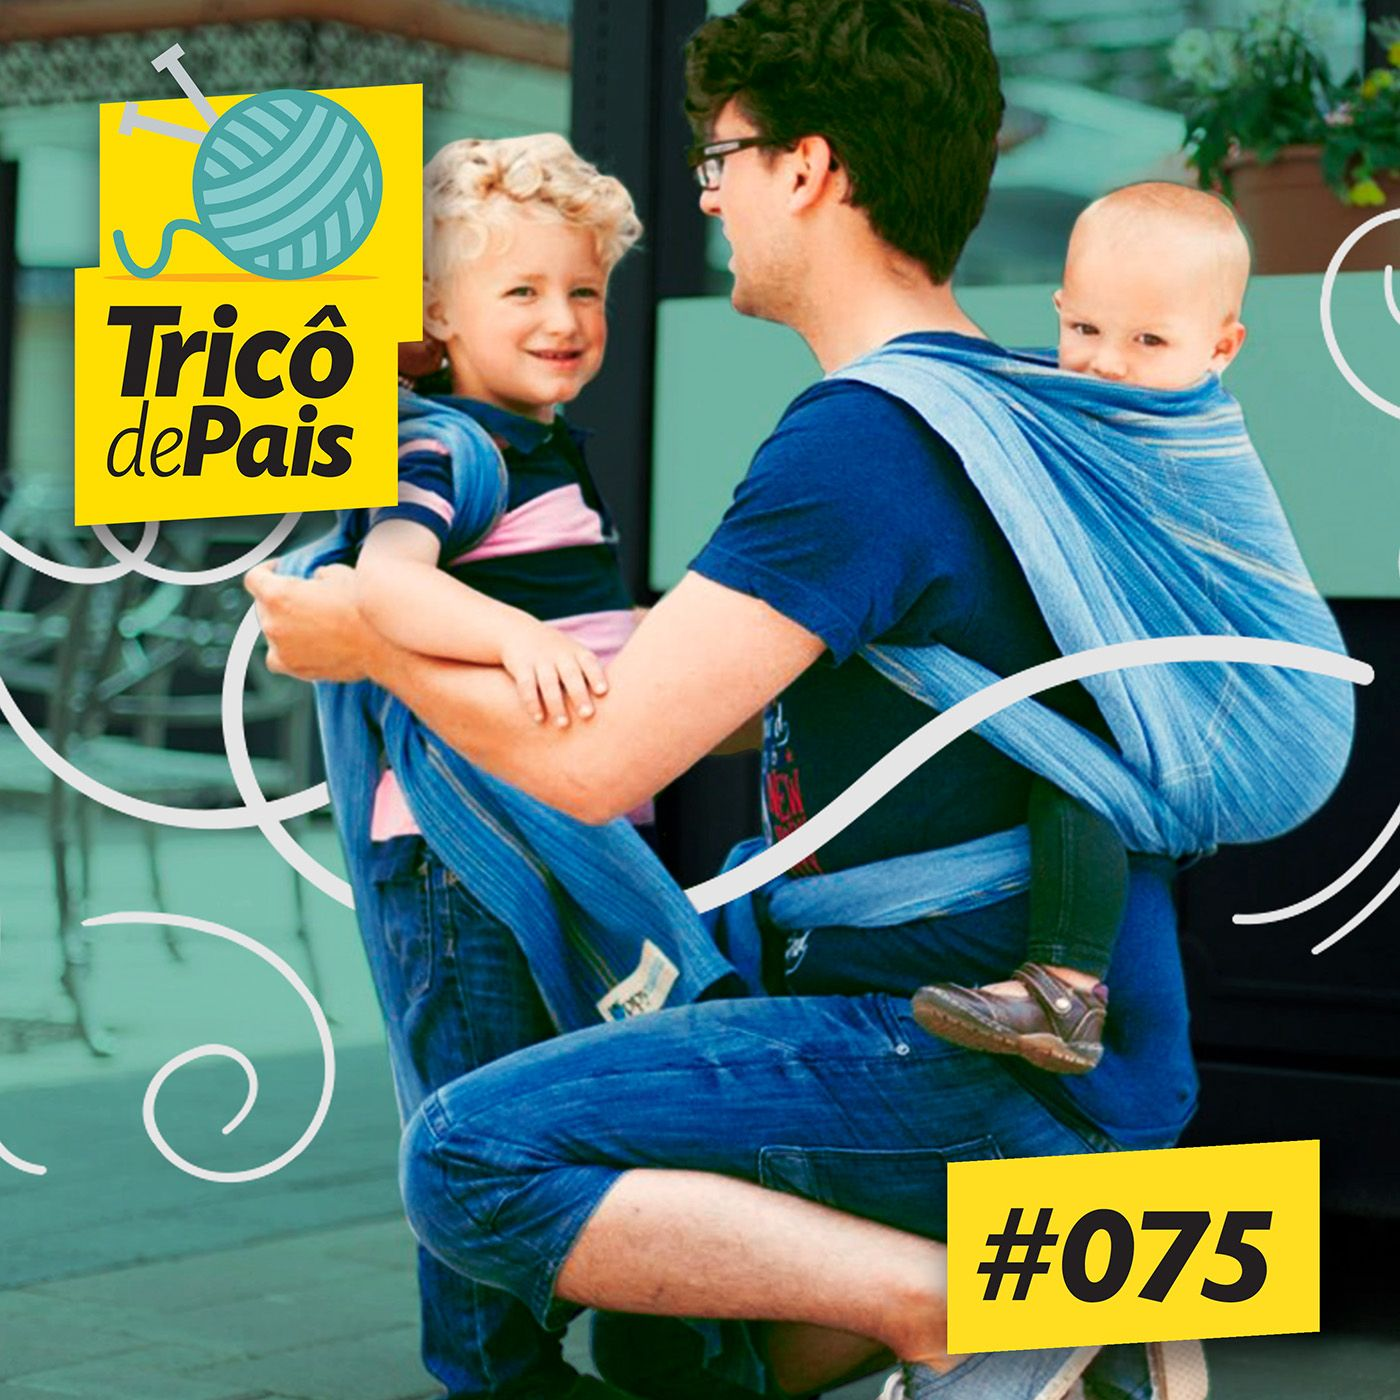 #075 - Babywearing feat. @paicarregadeiro